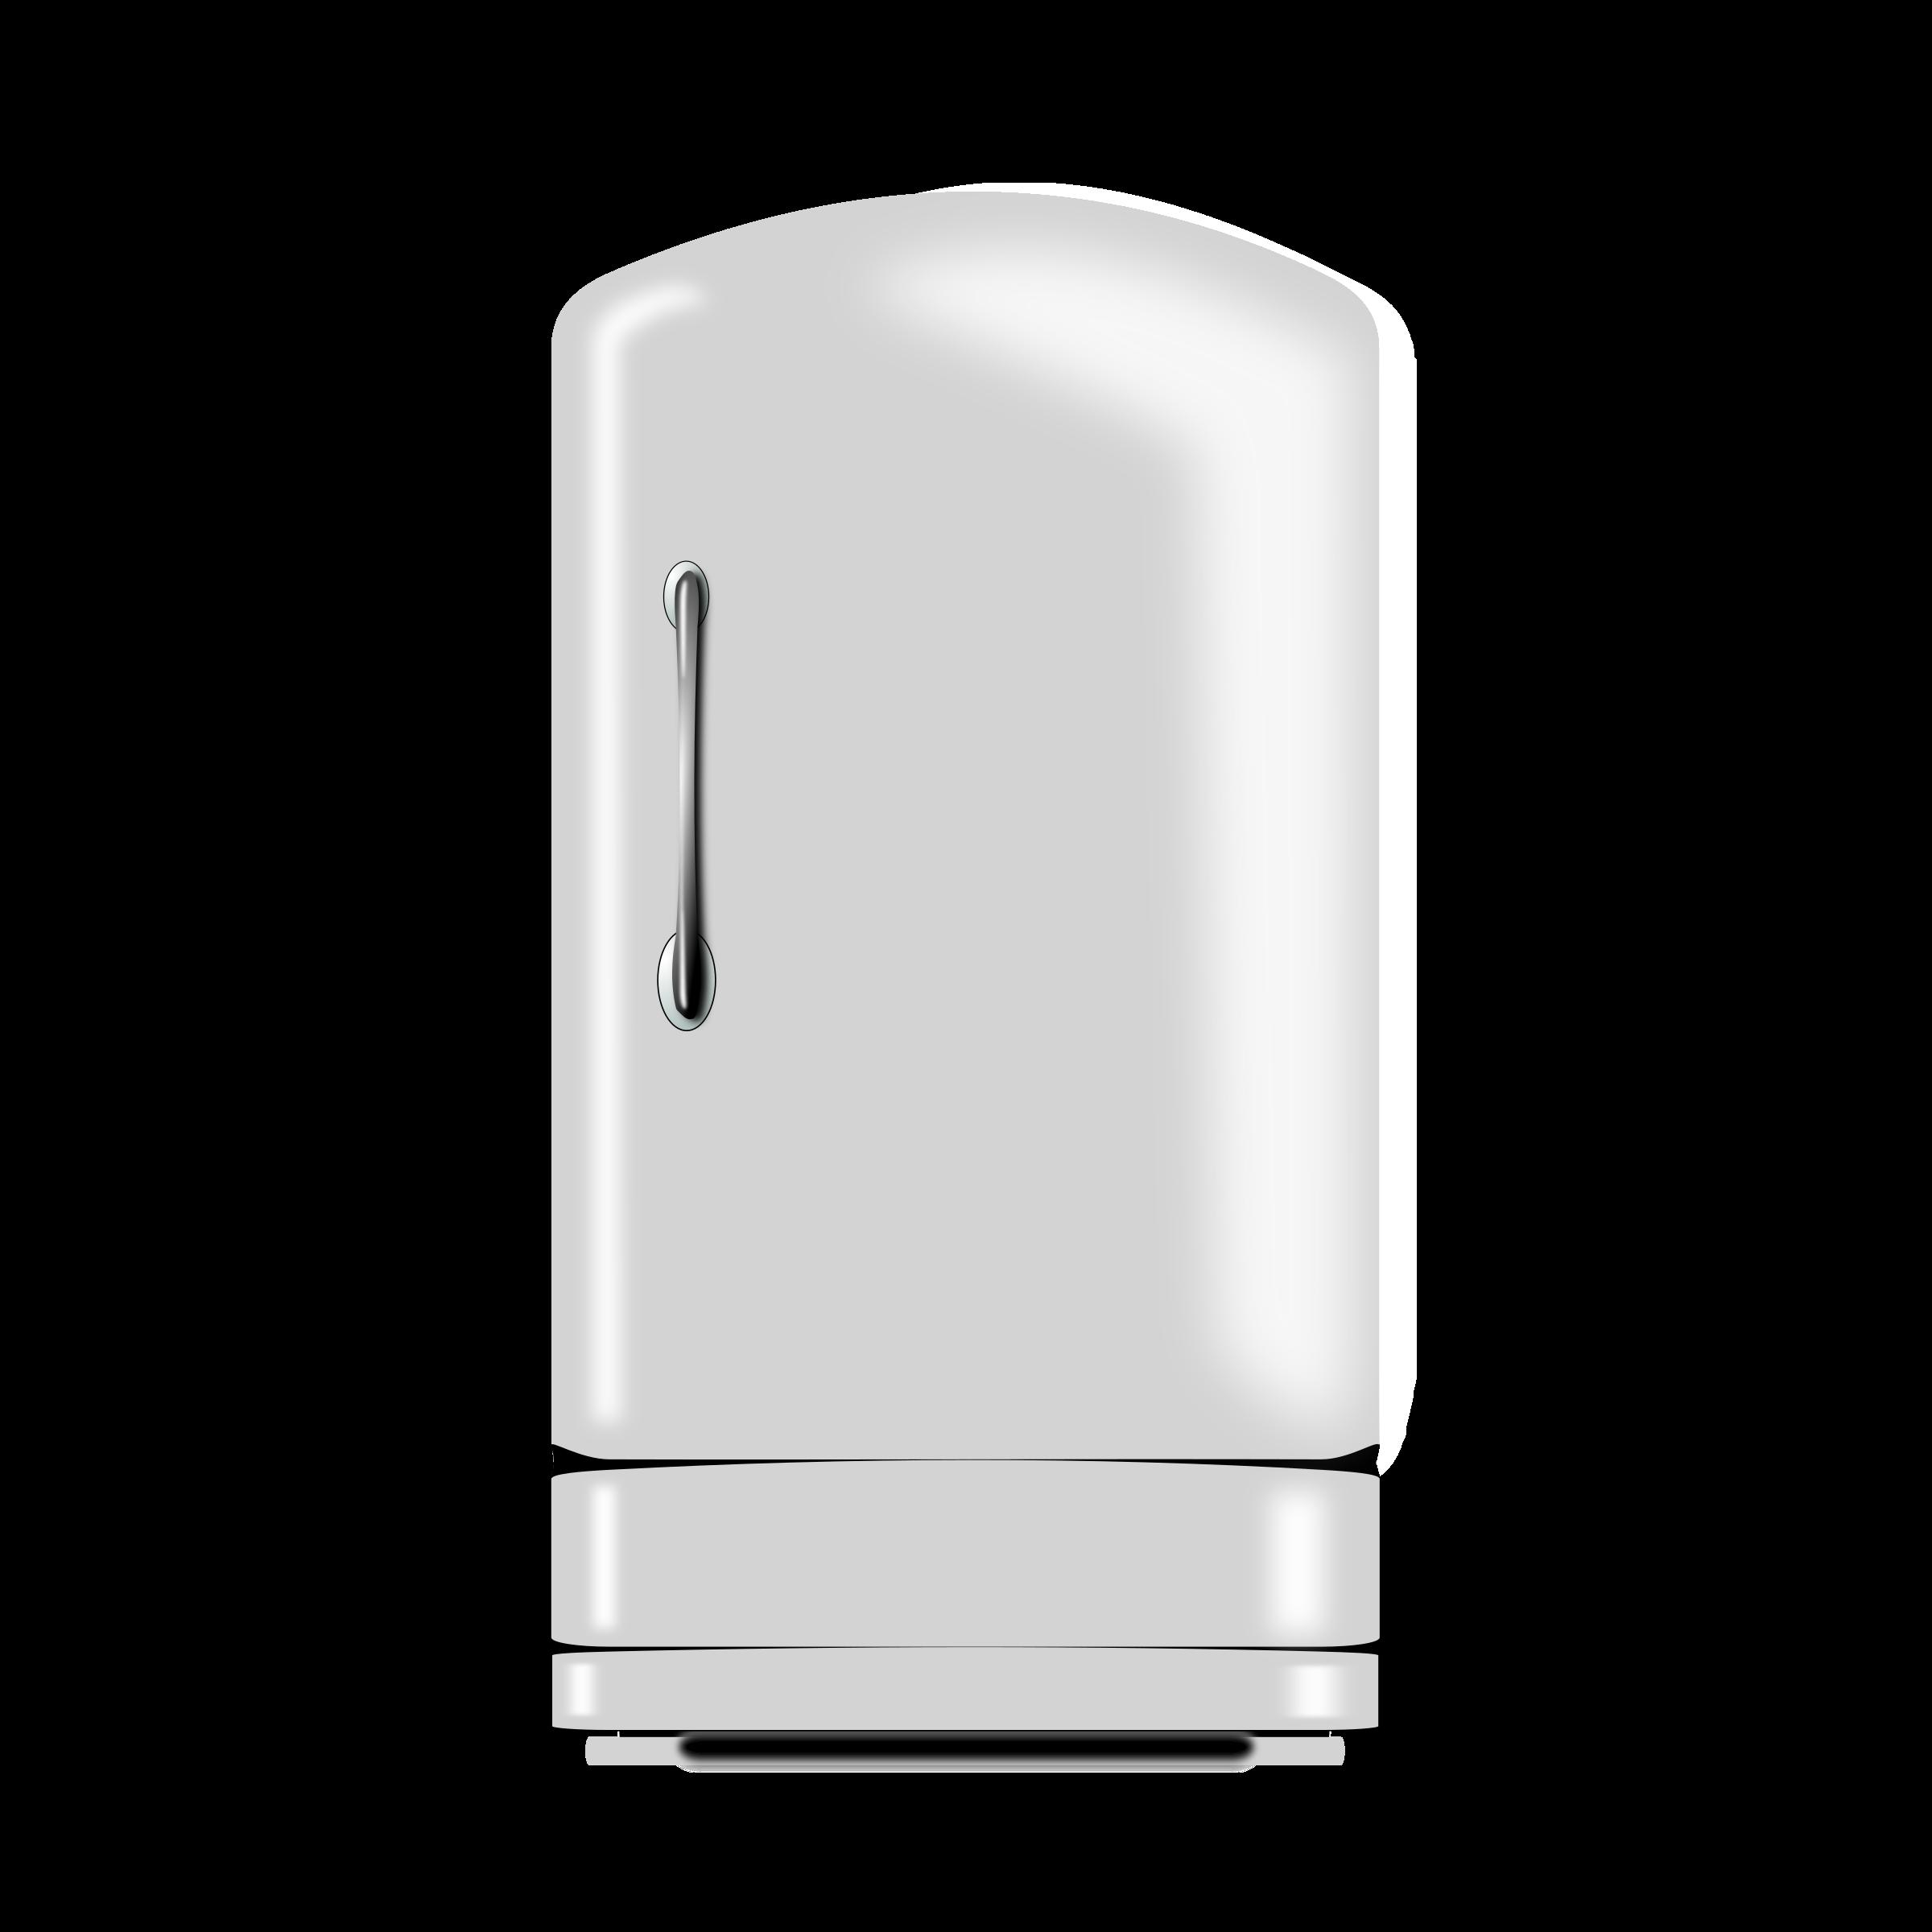 White icons png free. Fridge clipart clip art